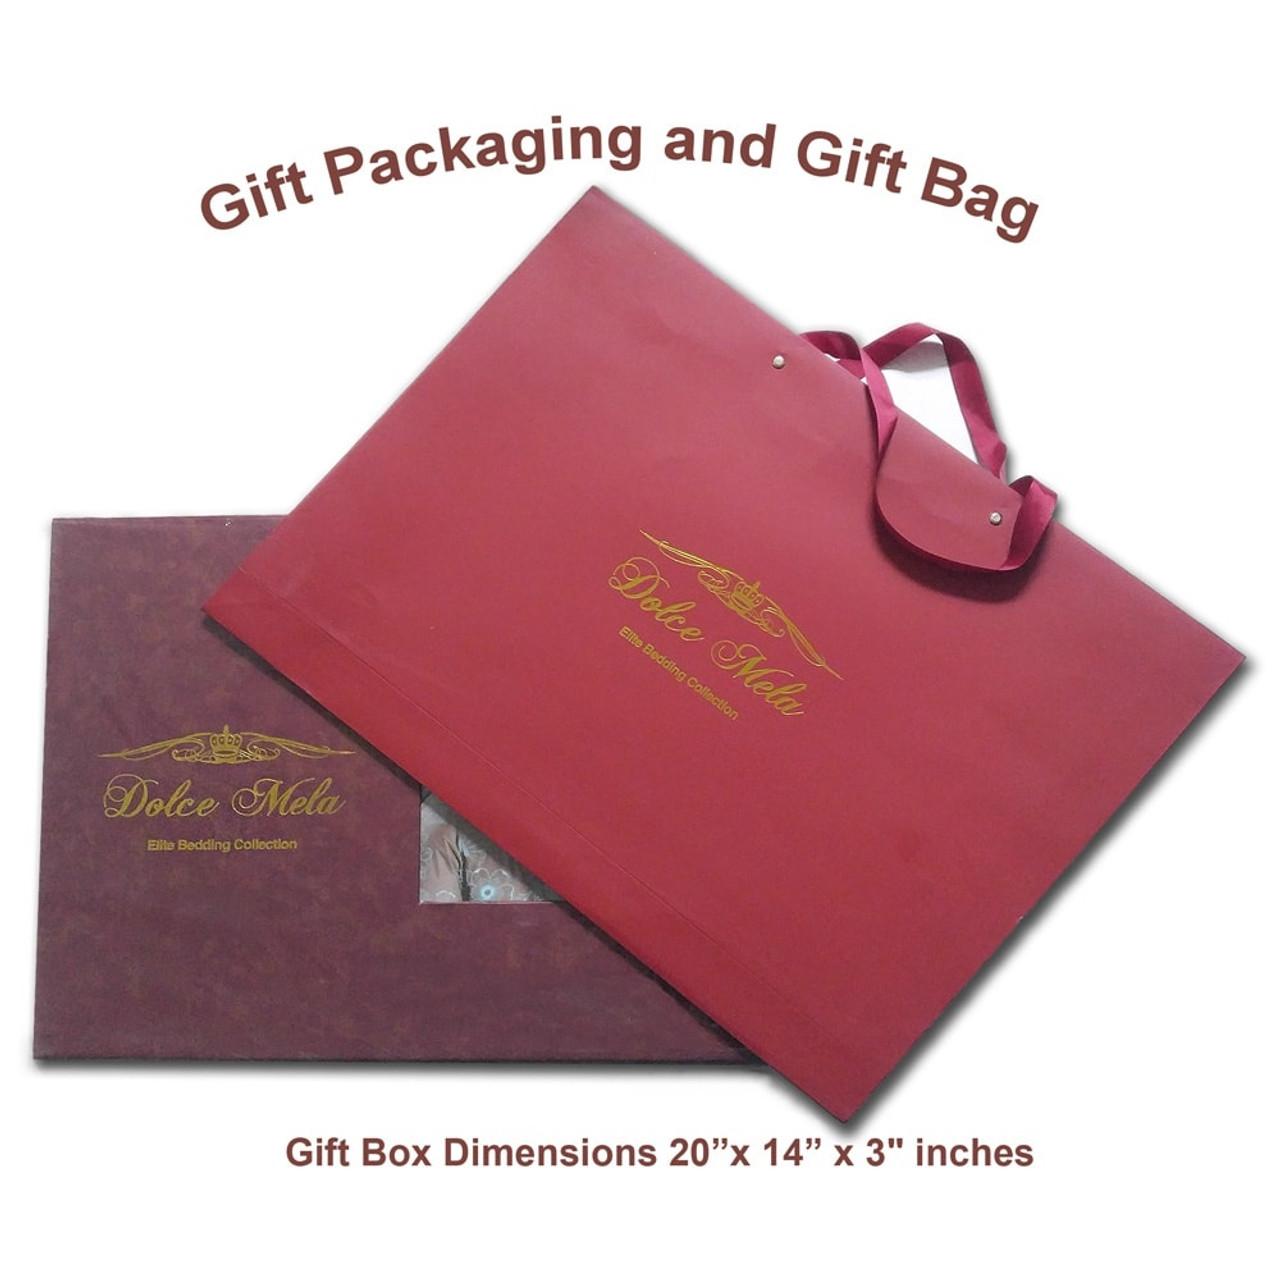 Dolce Mela Floral Bedding - Rosa, Luxury King size Duvet Cover Set DM510K